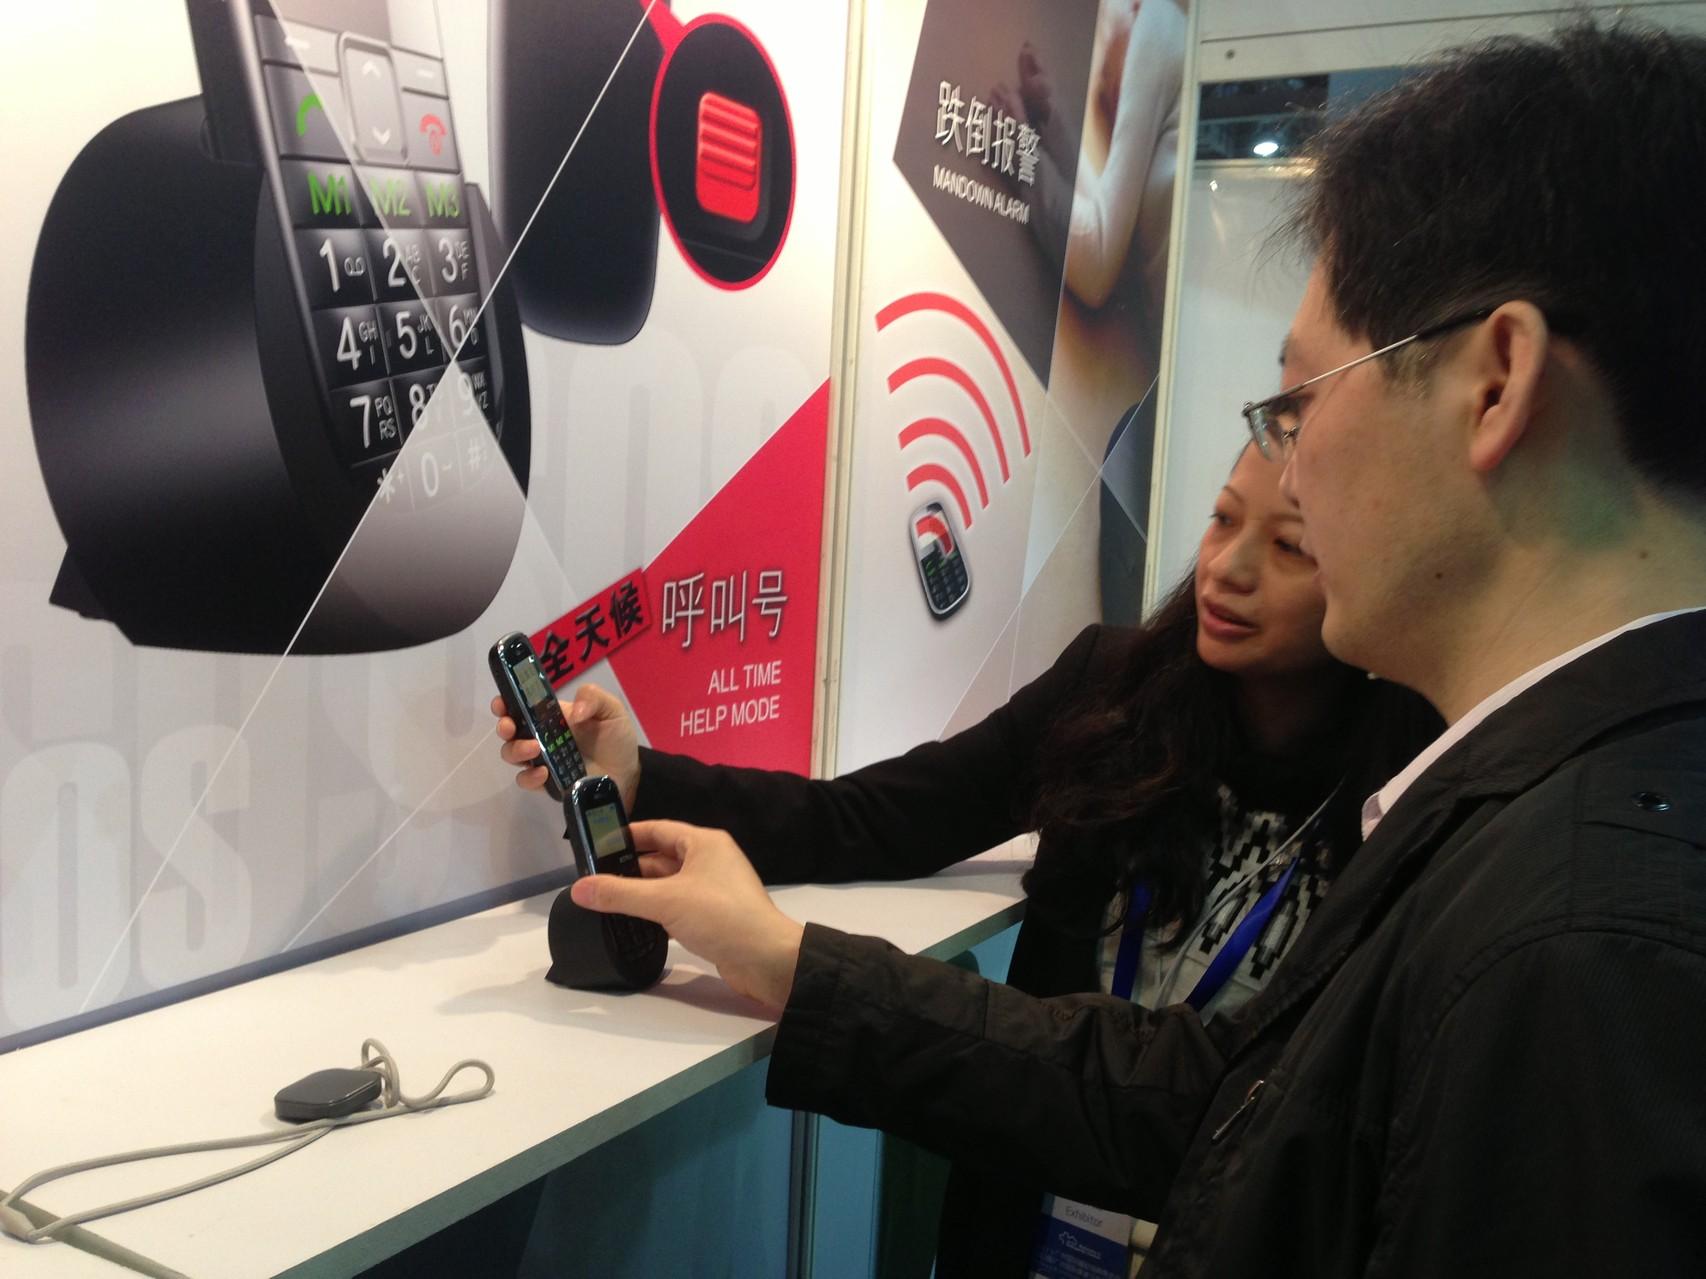 Demonstrating the function of elderly emergency mobile phone EC7000